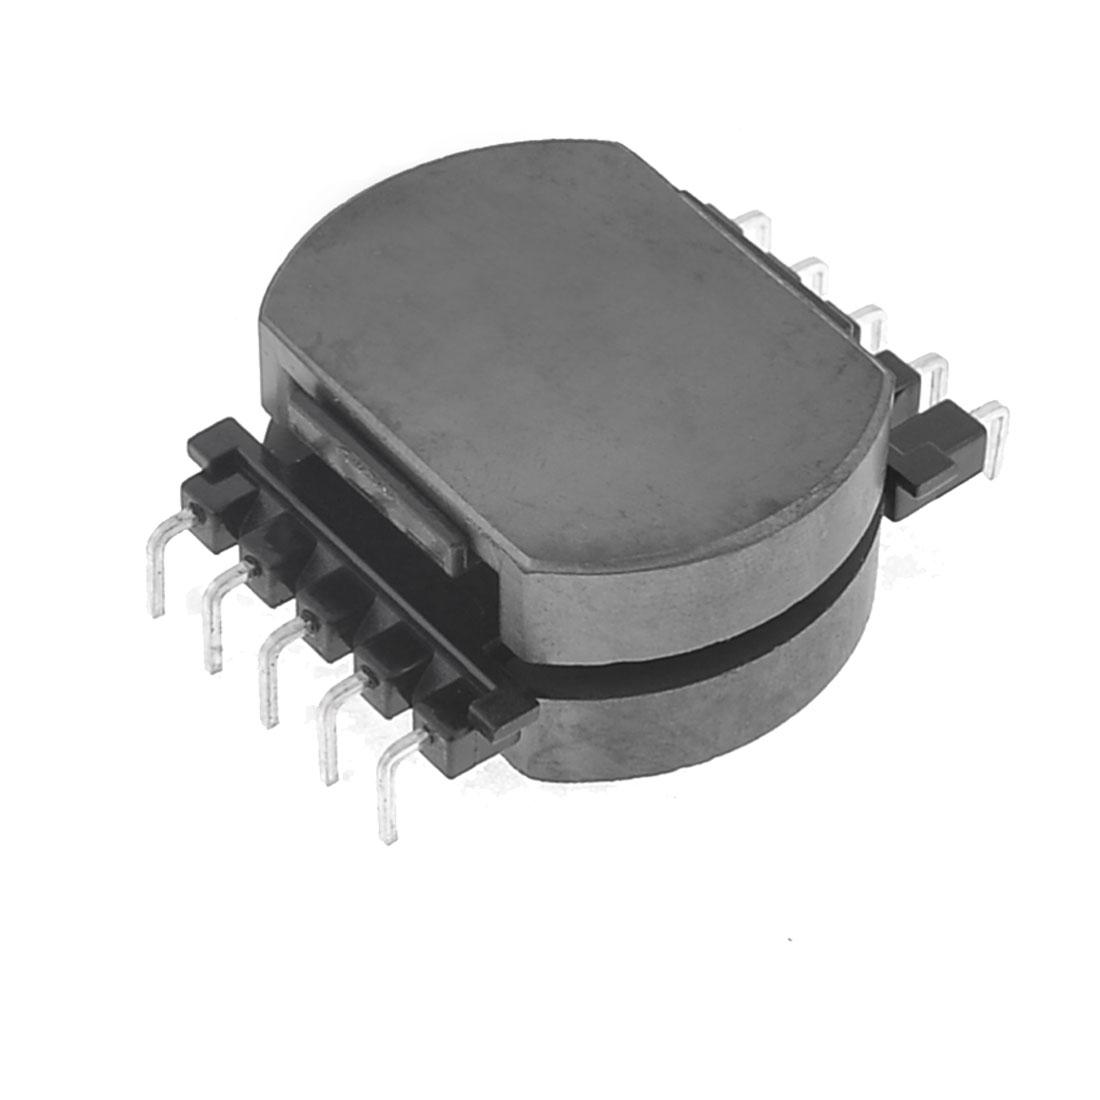 Inductor 10 Pin Plastic Coil Former Robbin w POT3312 Ferrite Cores